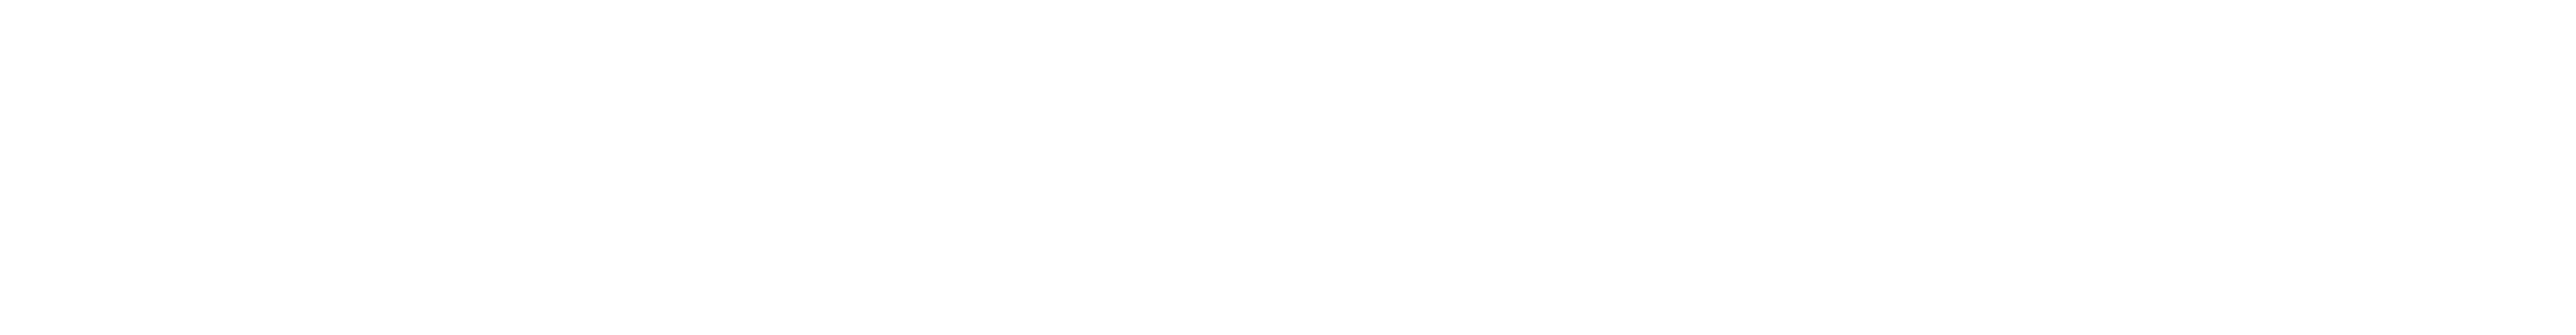 trademakers_logo_main_white